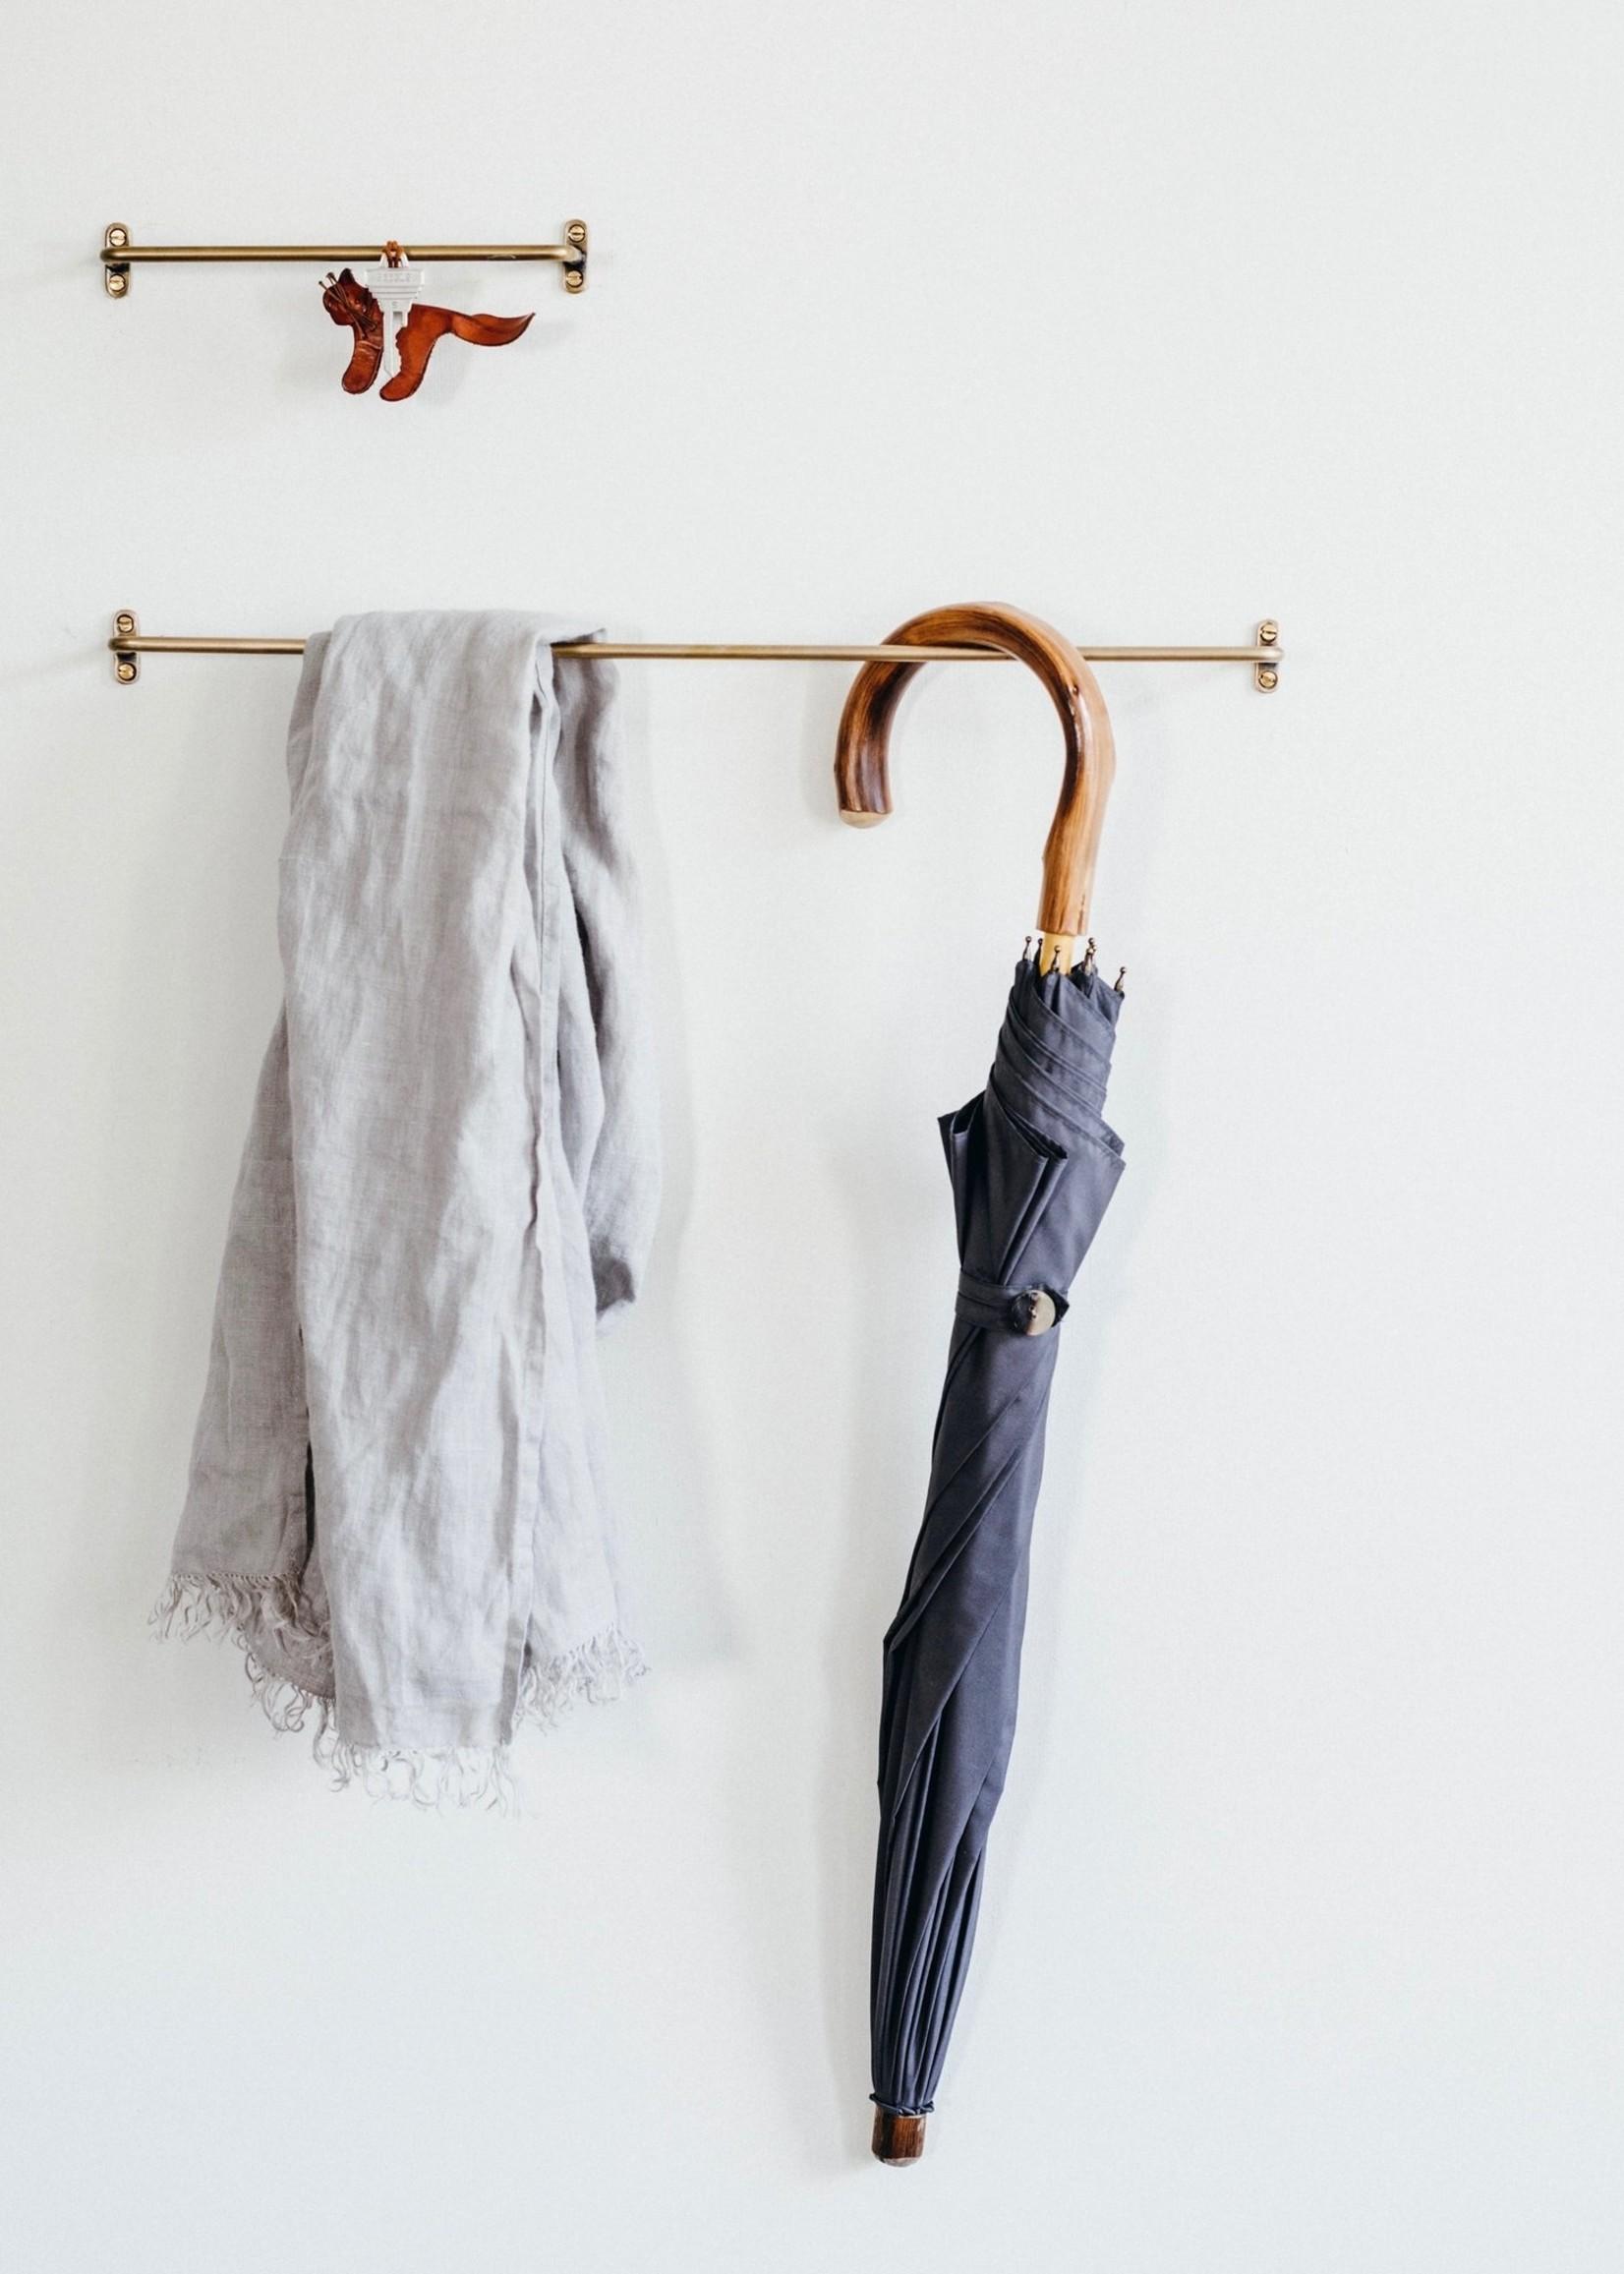 Handdoek stang - medium